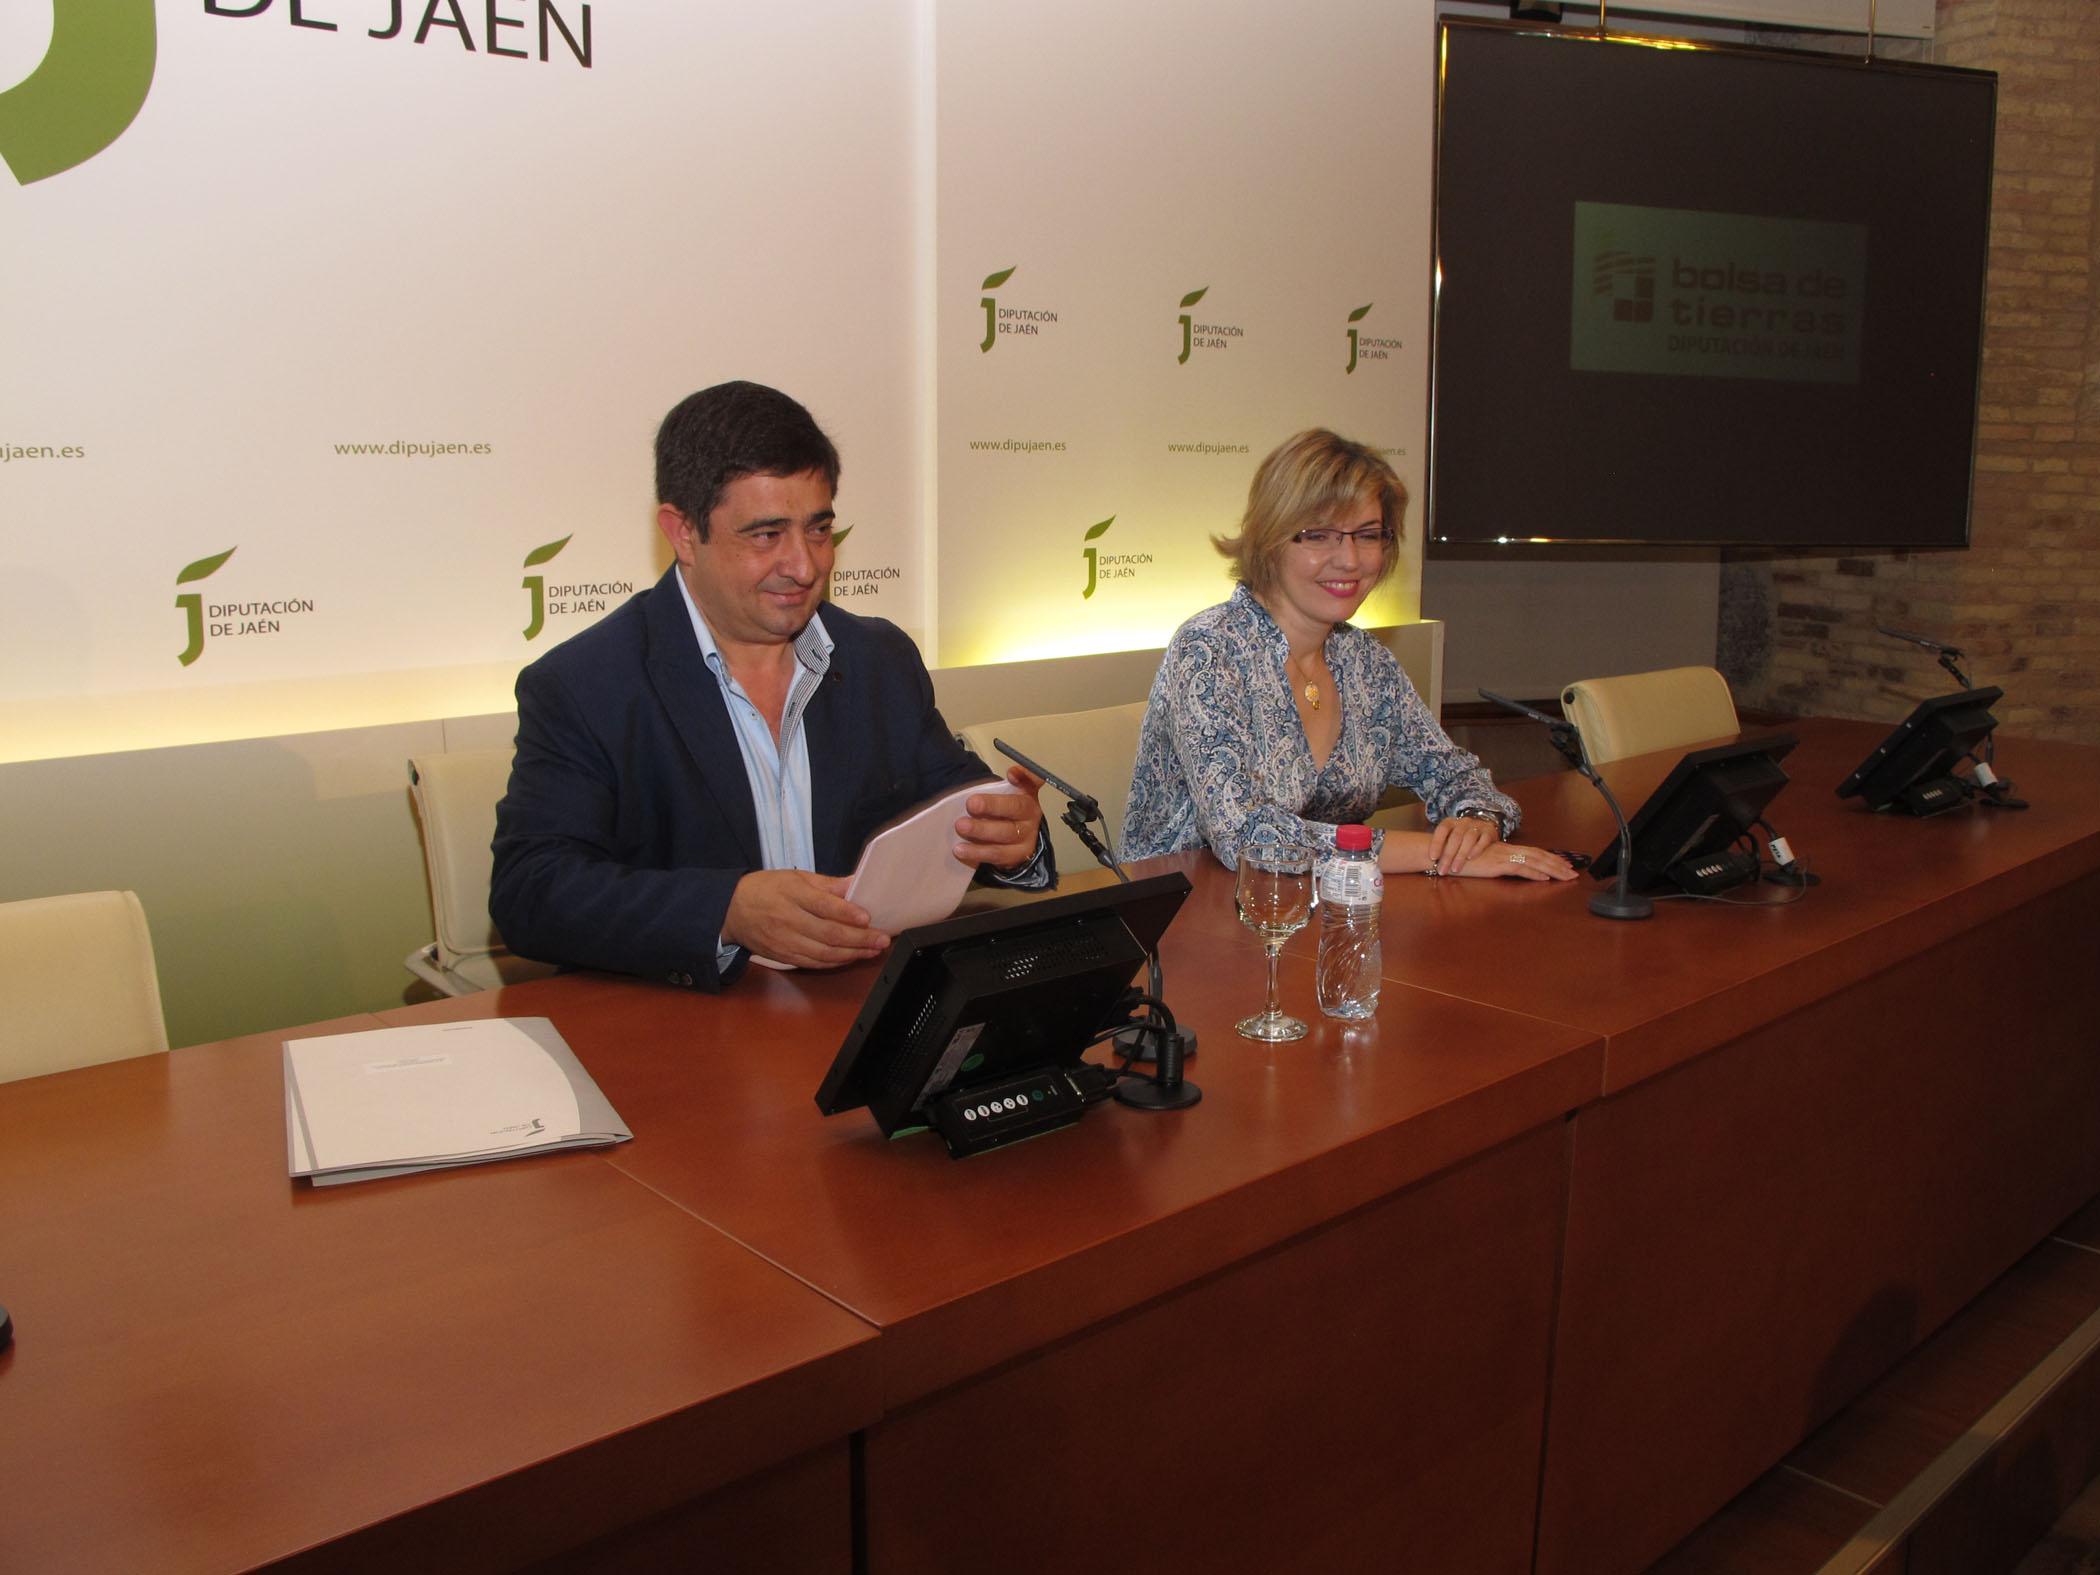 20131007_Presentacixn_subvenciones_empleo_agrario_x1x